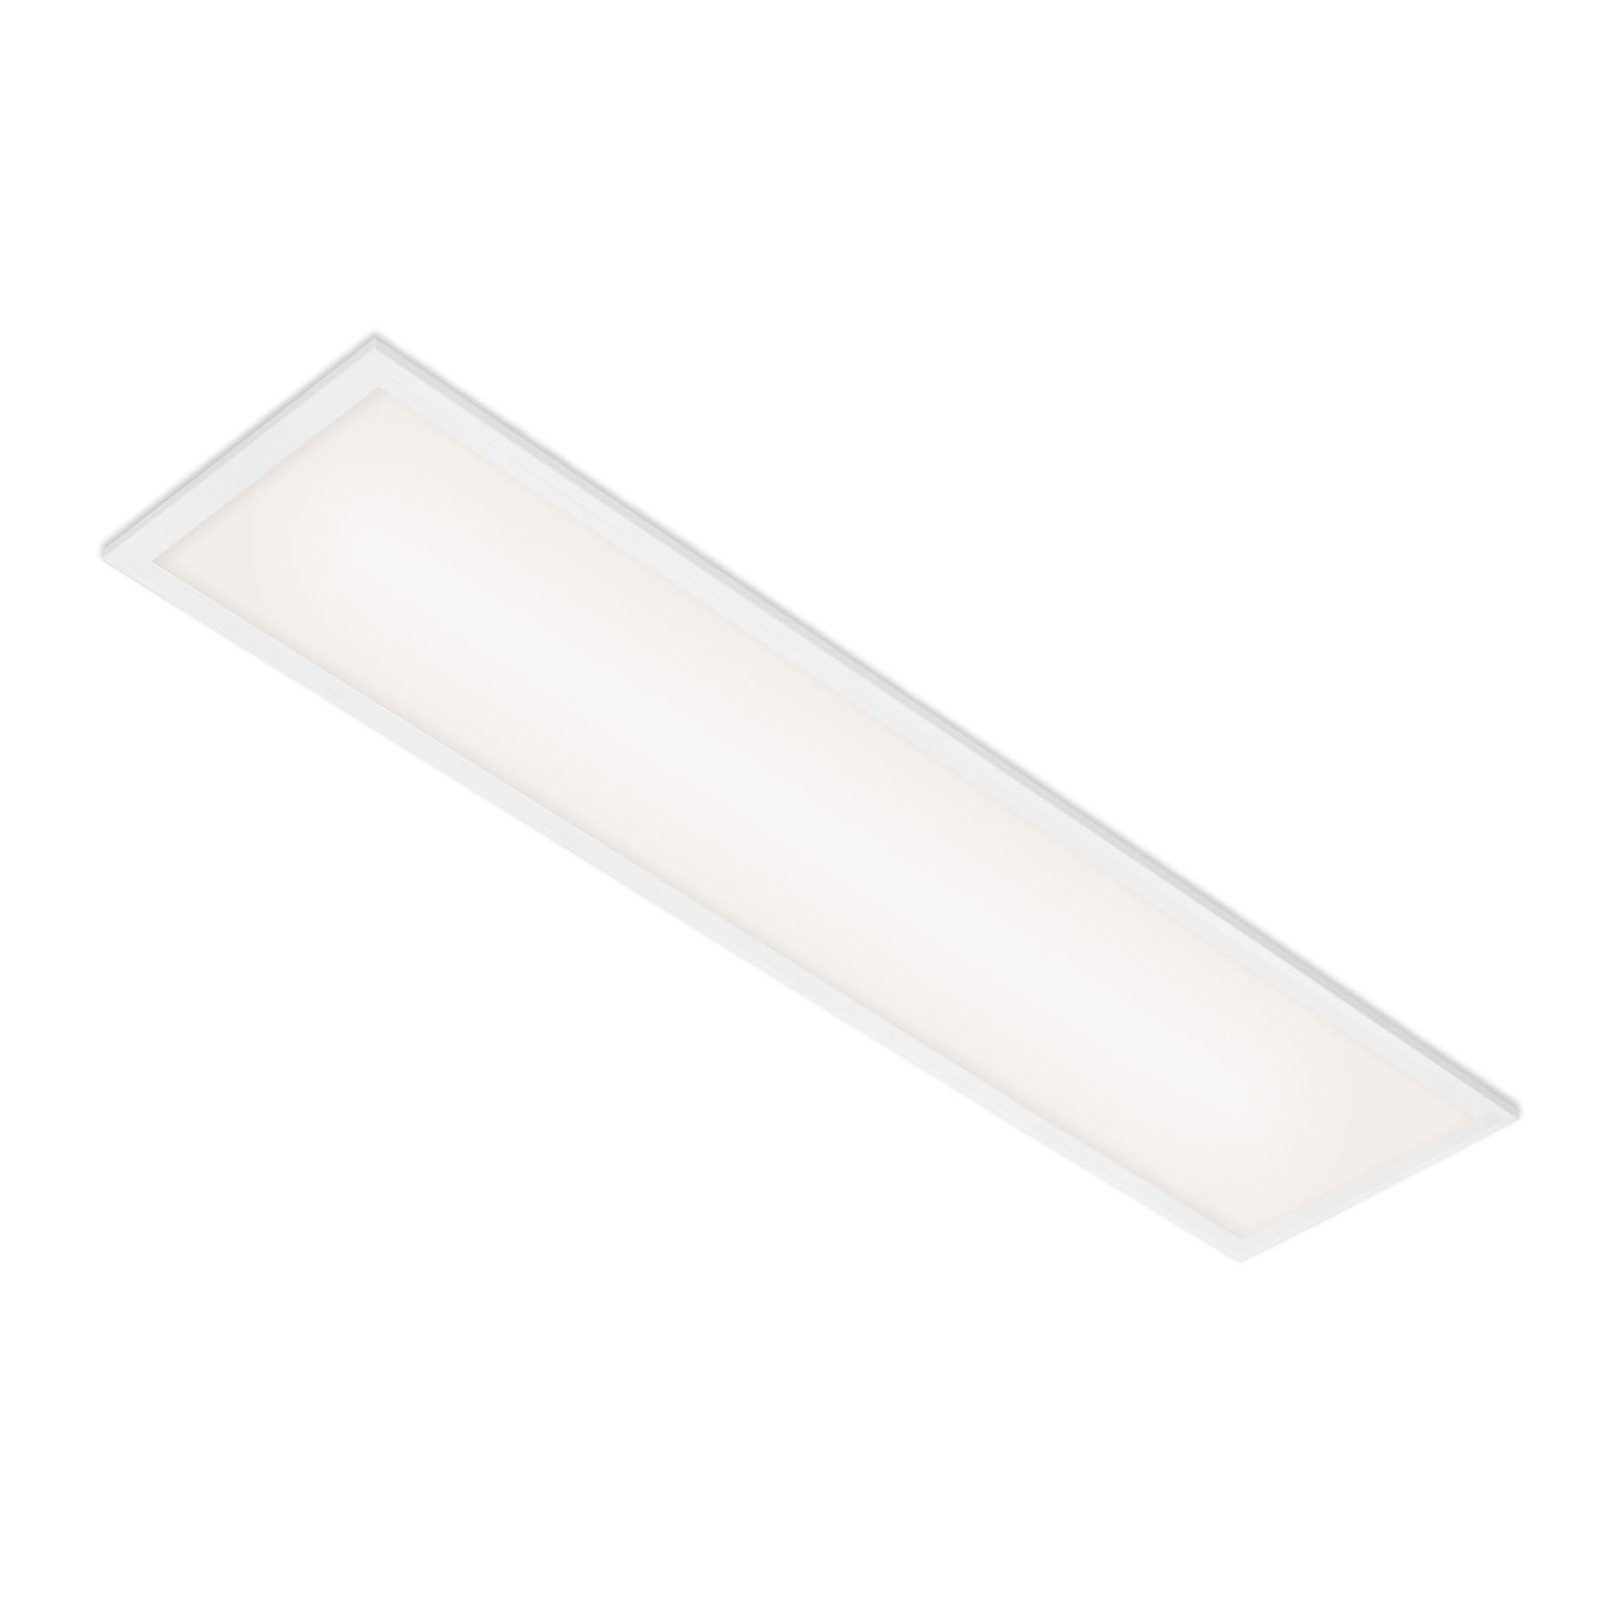 Simple LED panel, white, ultra-flat, 100 x 25 cm_1510585_1